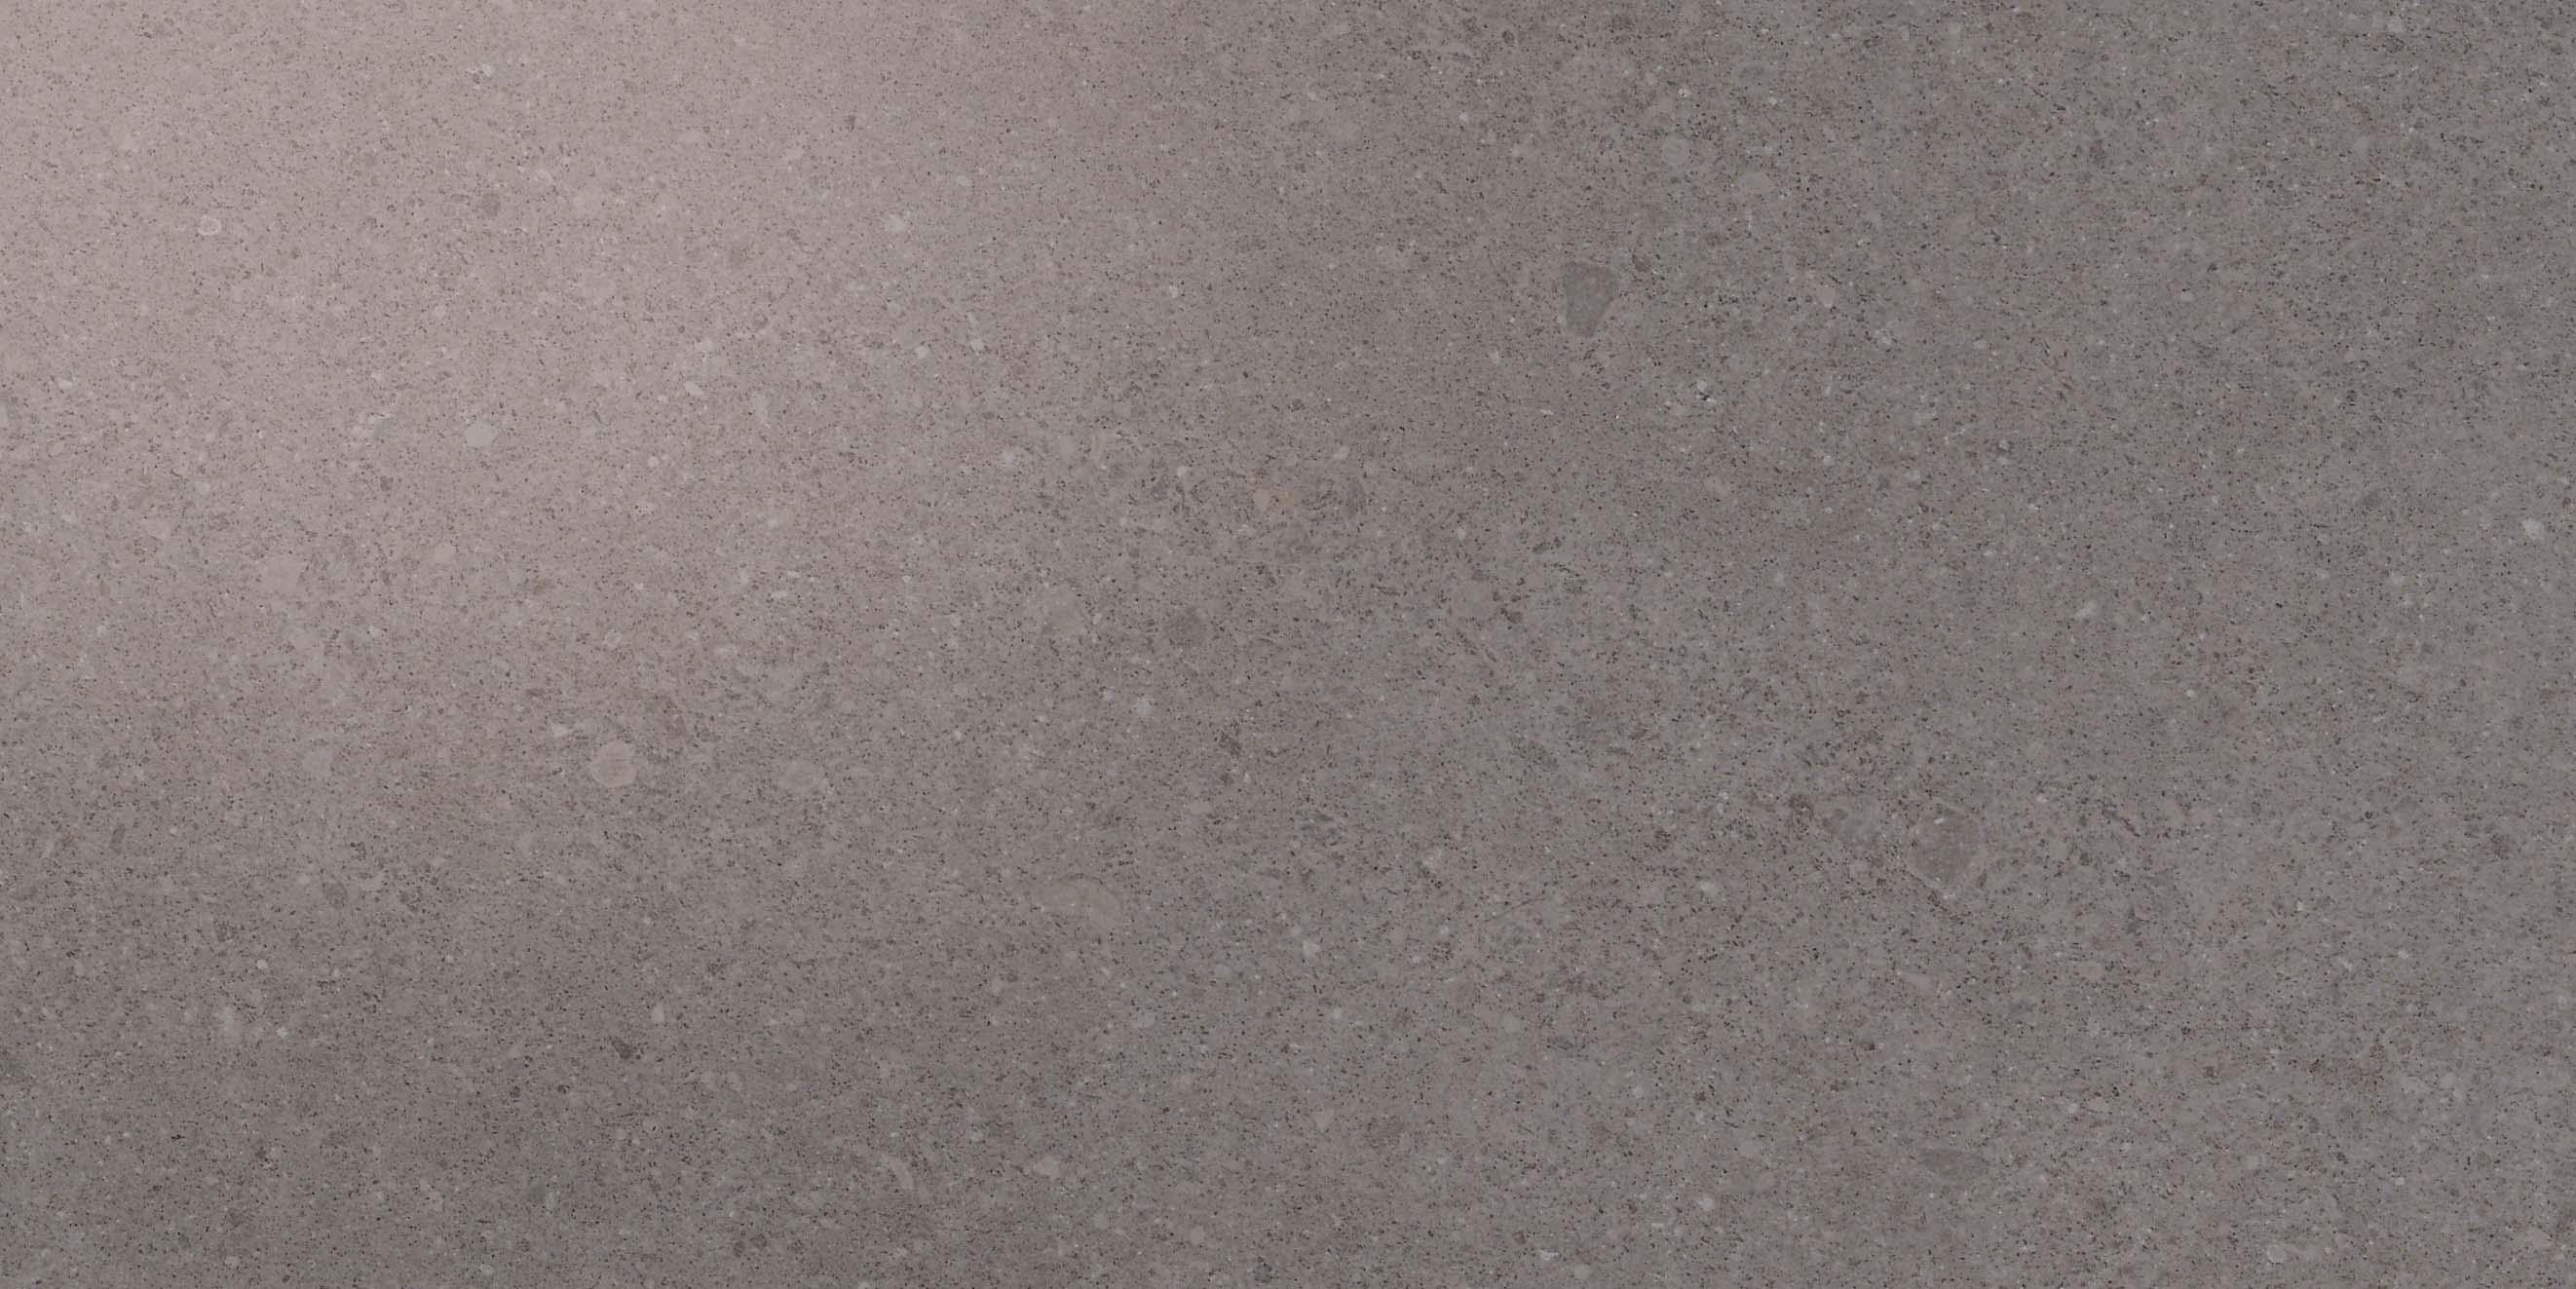 Kone Grey By Atlas Concorde Ceramic Tiles